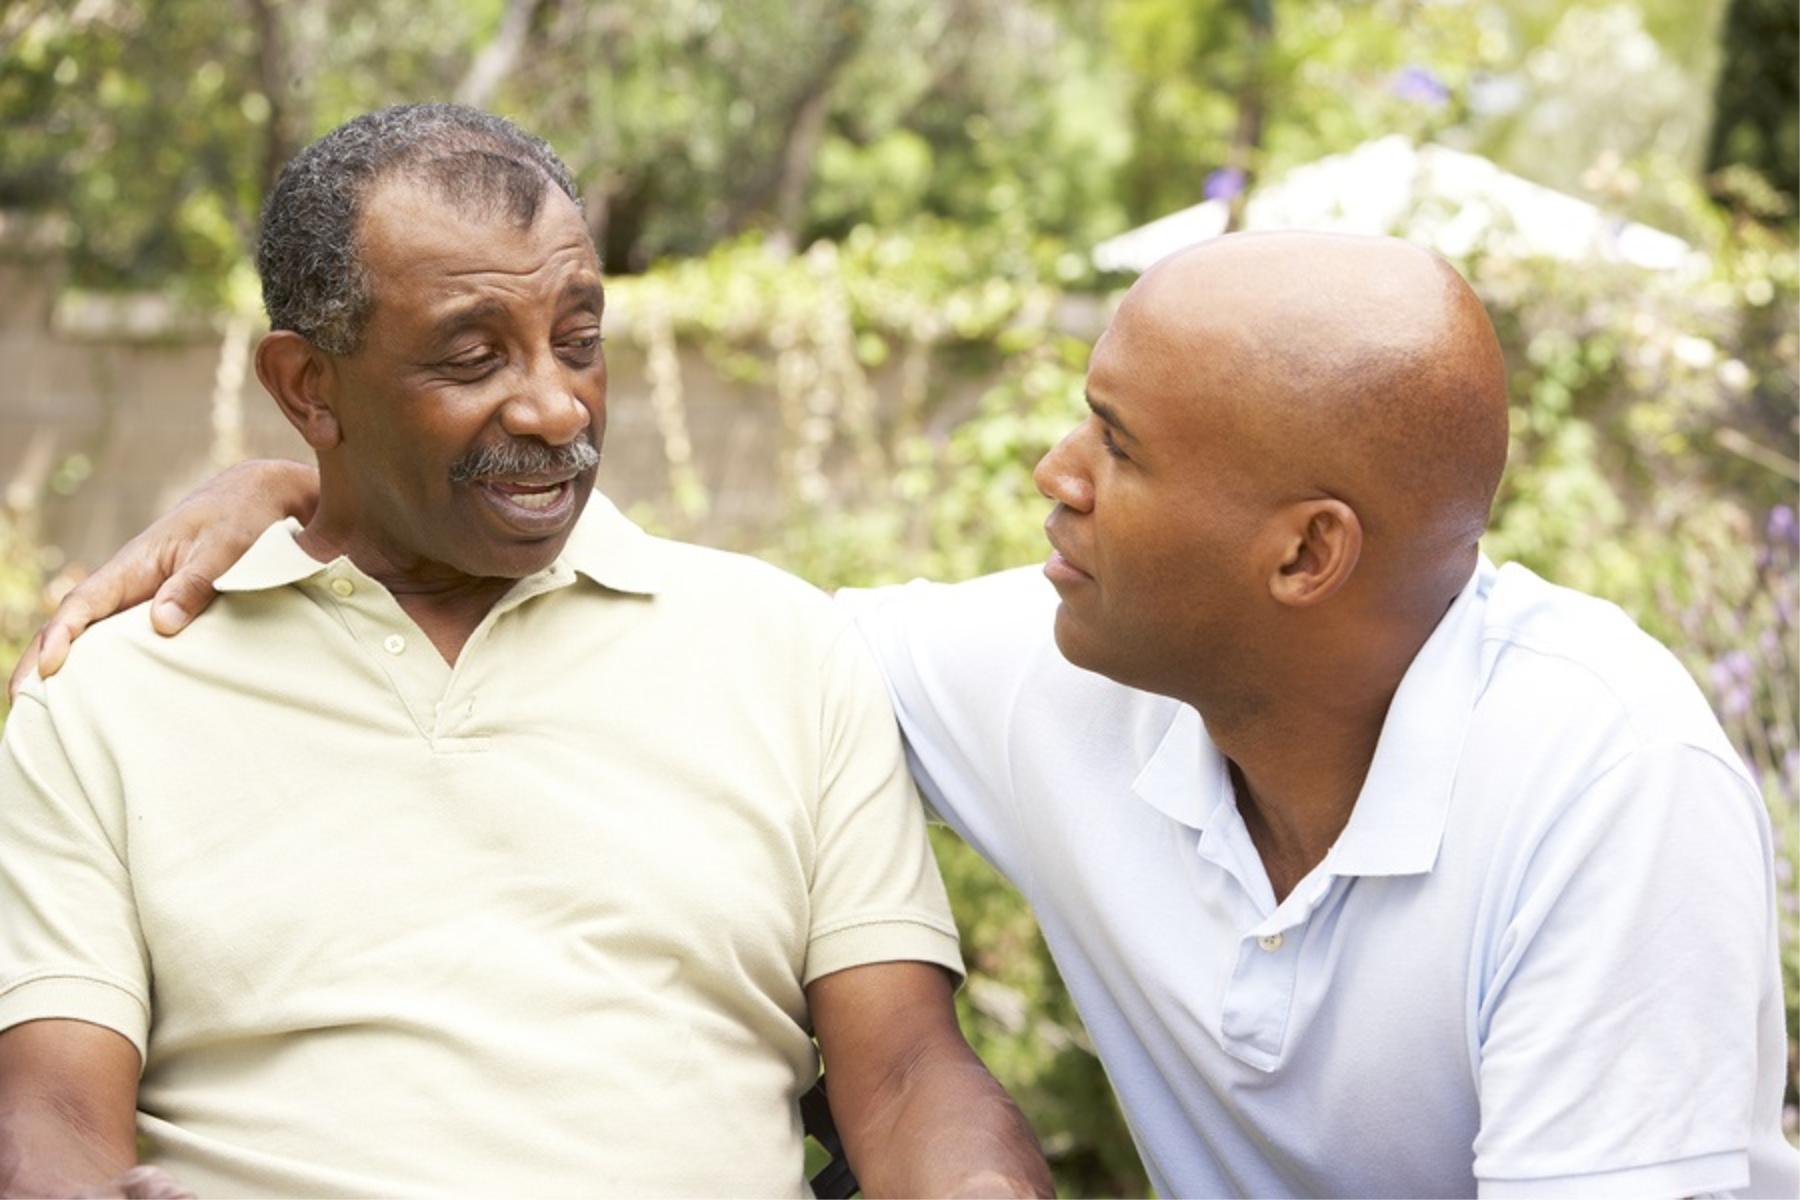 Caregiver in Scottsdale AZ: Your Senior Needs More Help